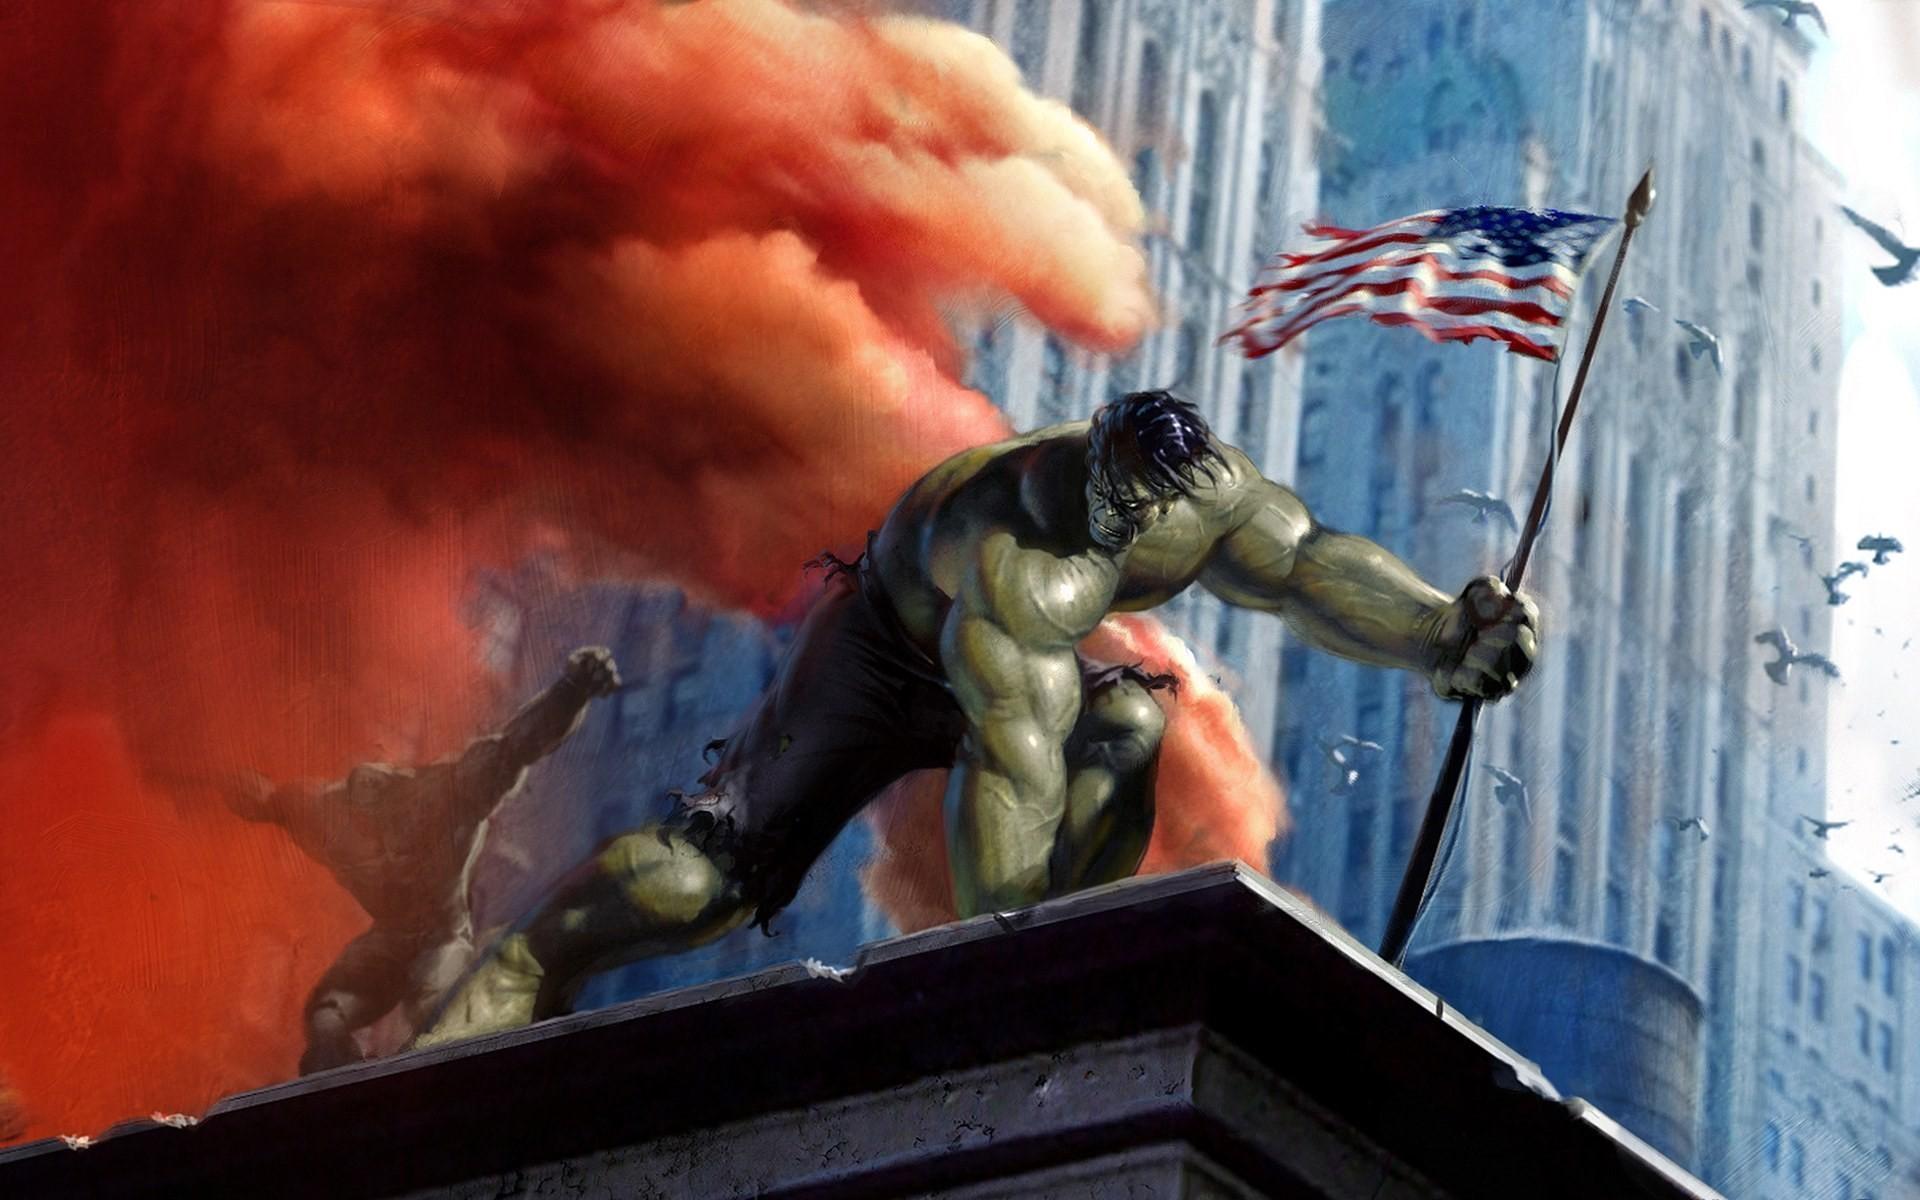 hulk pic full hd, 362 kB – Fell Kingsman